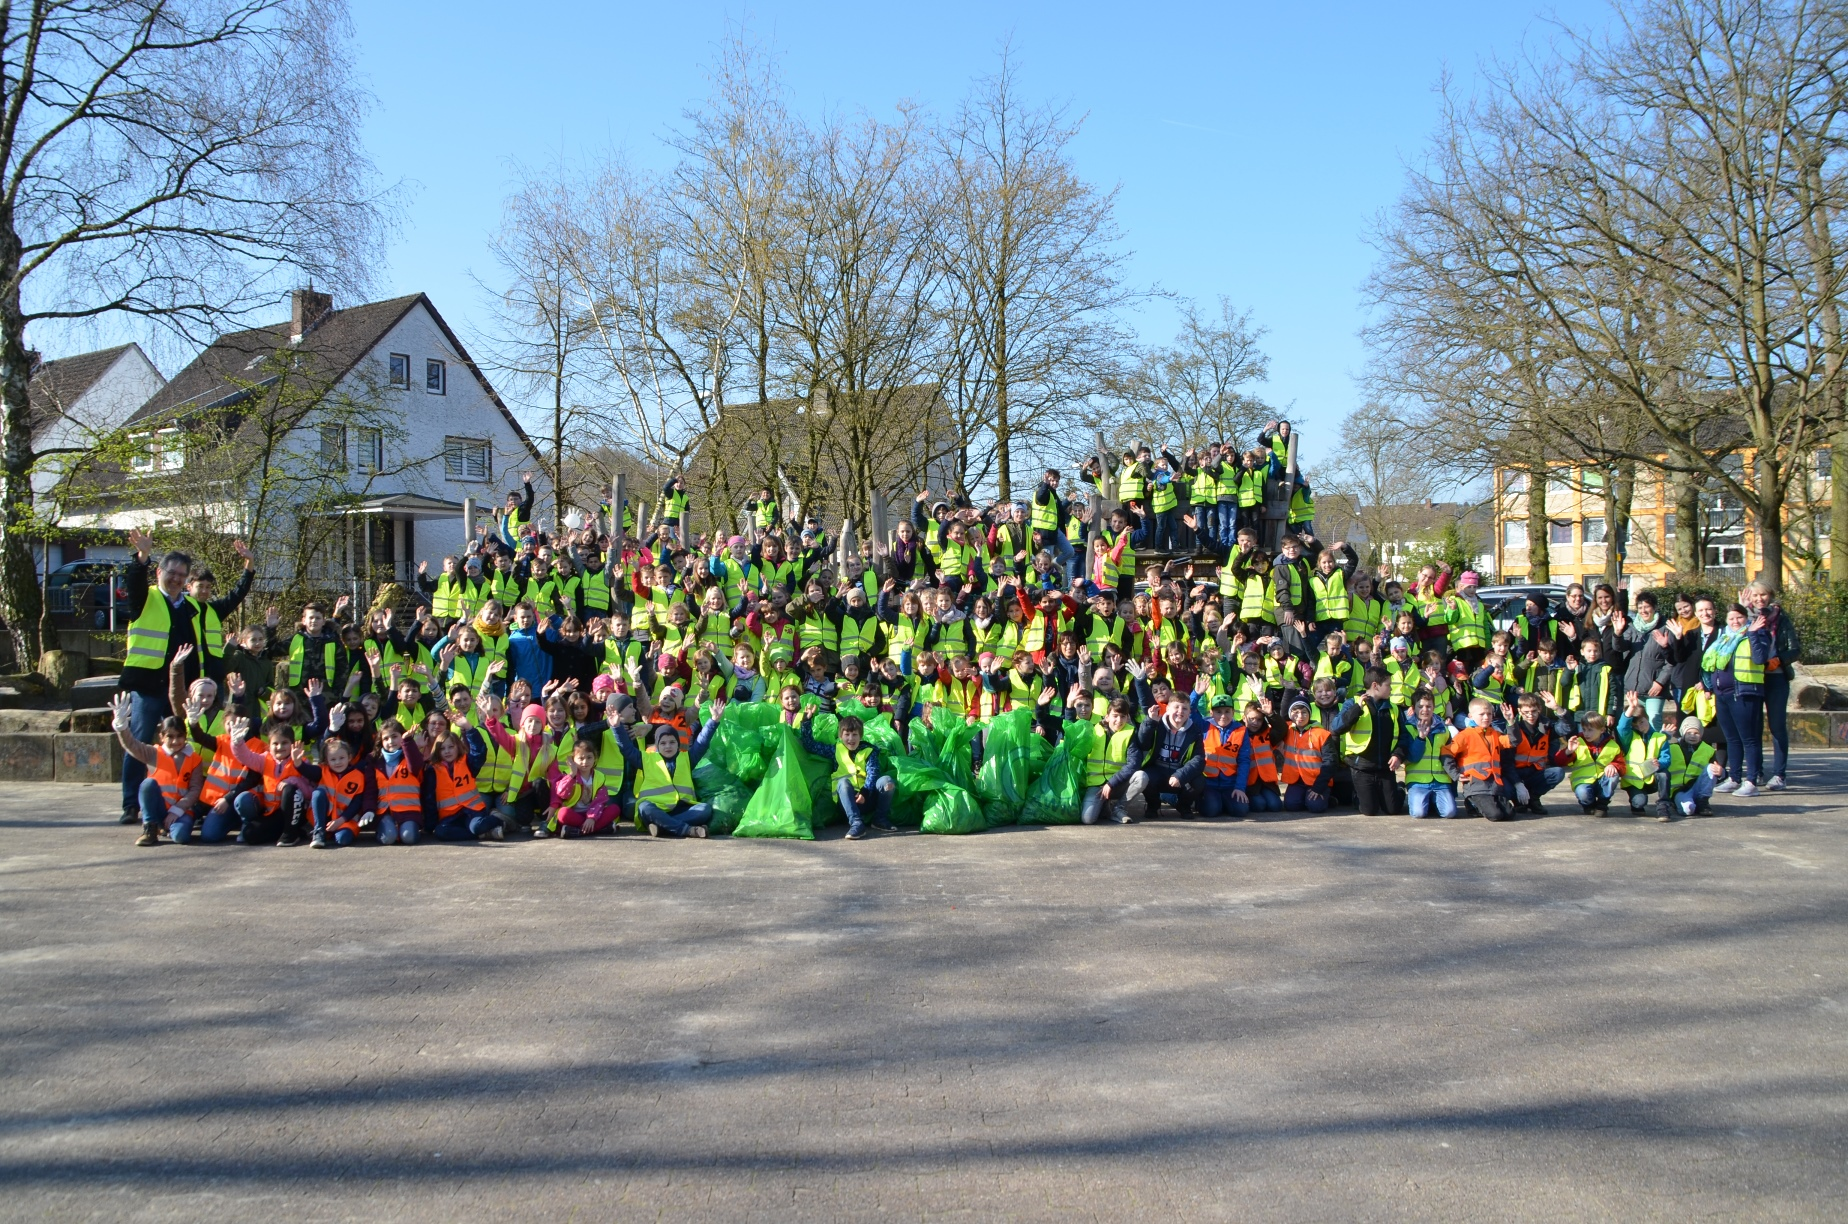 Schüler der Grundschule Belm, Foto: Gemeinde Belm/D. Meyer